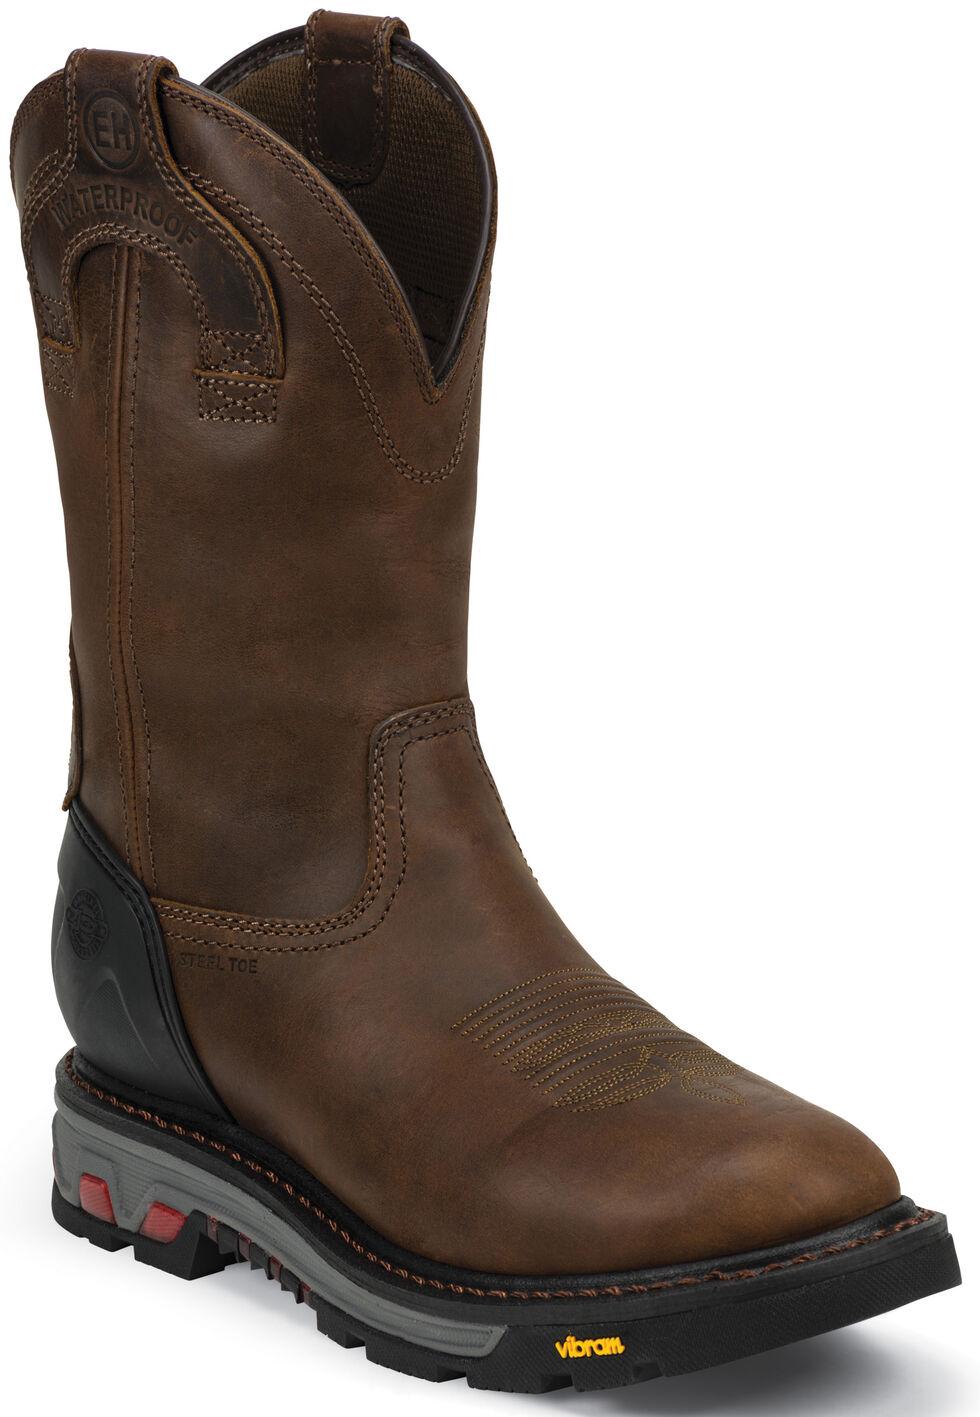 Justin Men's Mechanic Brown EH Waterproof Work Boots - Steel Toe, Brown, hi-res